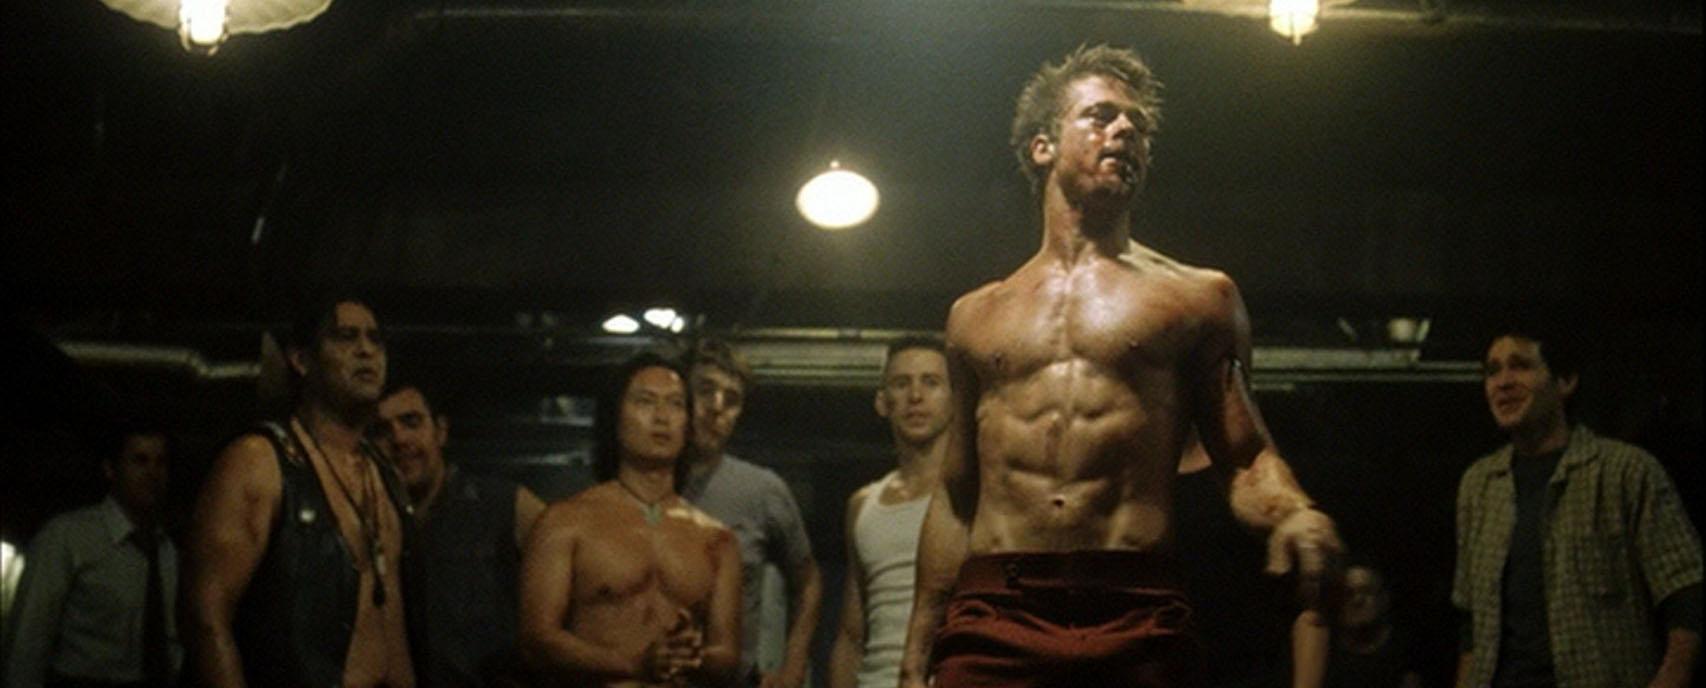 brad pitt fight club lean and defined body